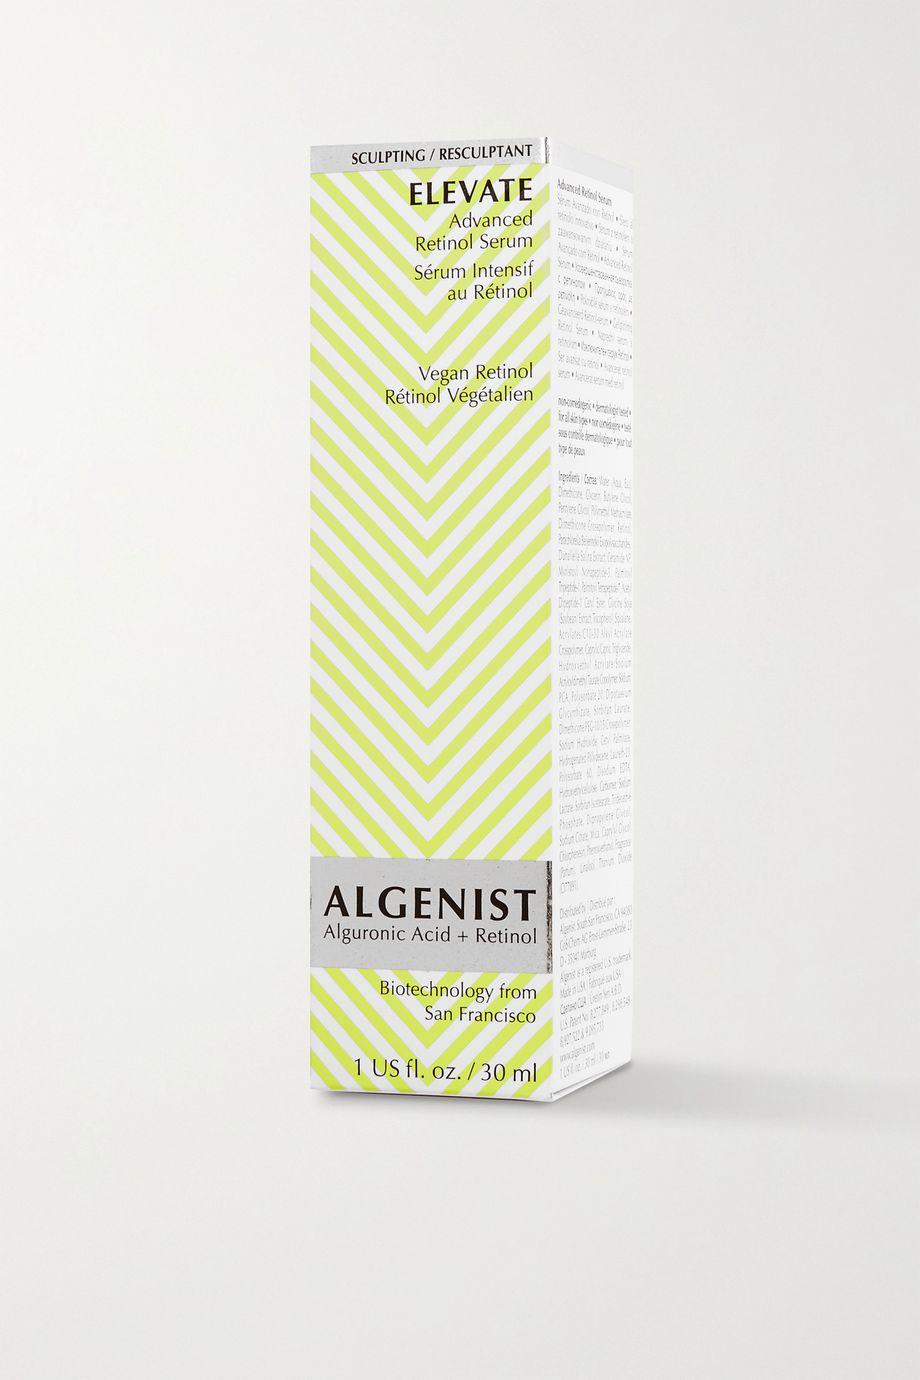 Algenist ELEVATE Advanced Retinol Serum, 30ml